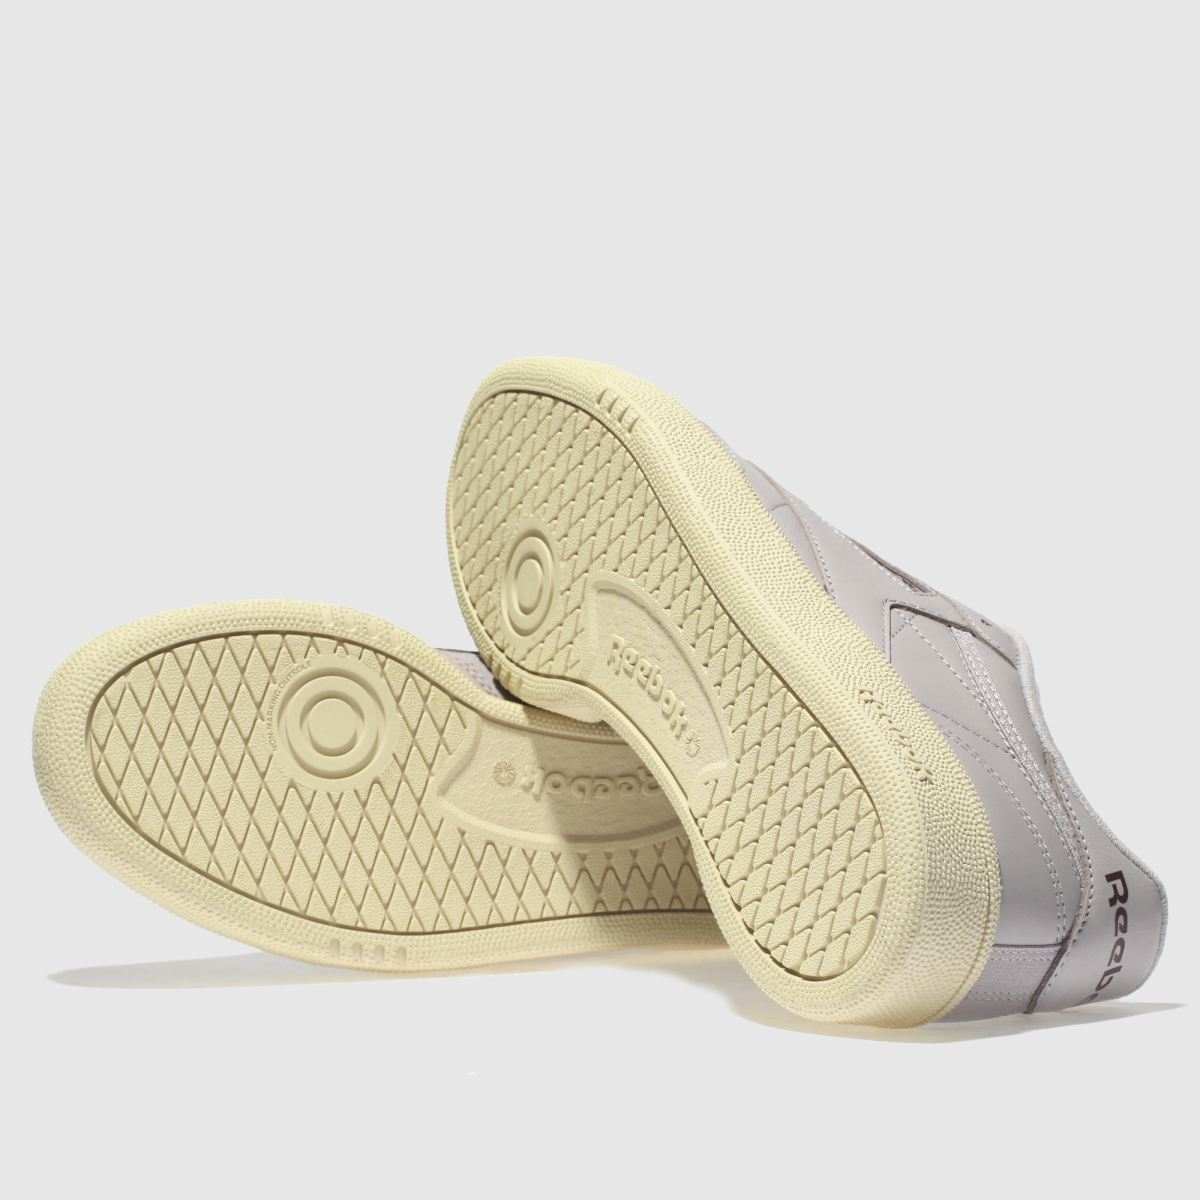 Damen Blaulila Sneaker reebok Club C Vintage Sneaker Blaulila | schuh Gute Qualität beliebte Schuhe 83f8fd